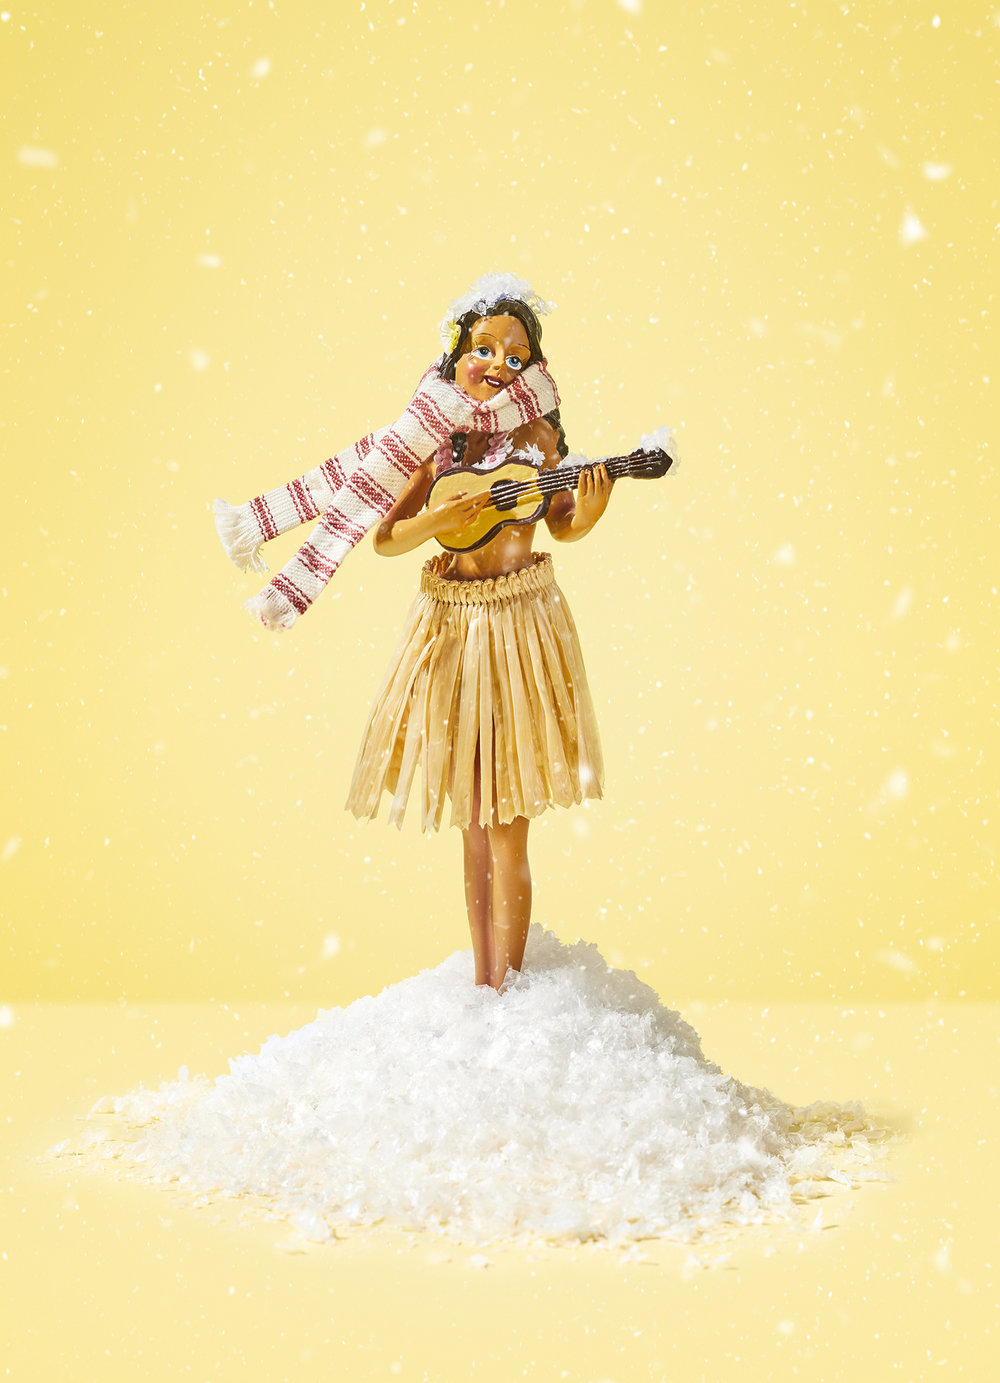 strain_game_Hawaiian_Snow.jpg